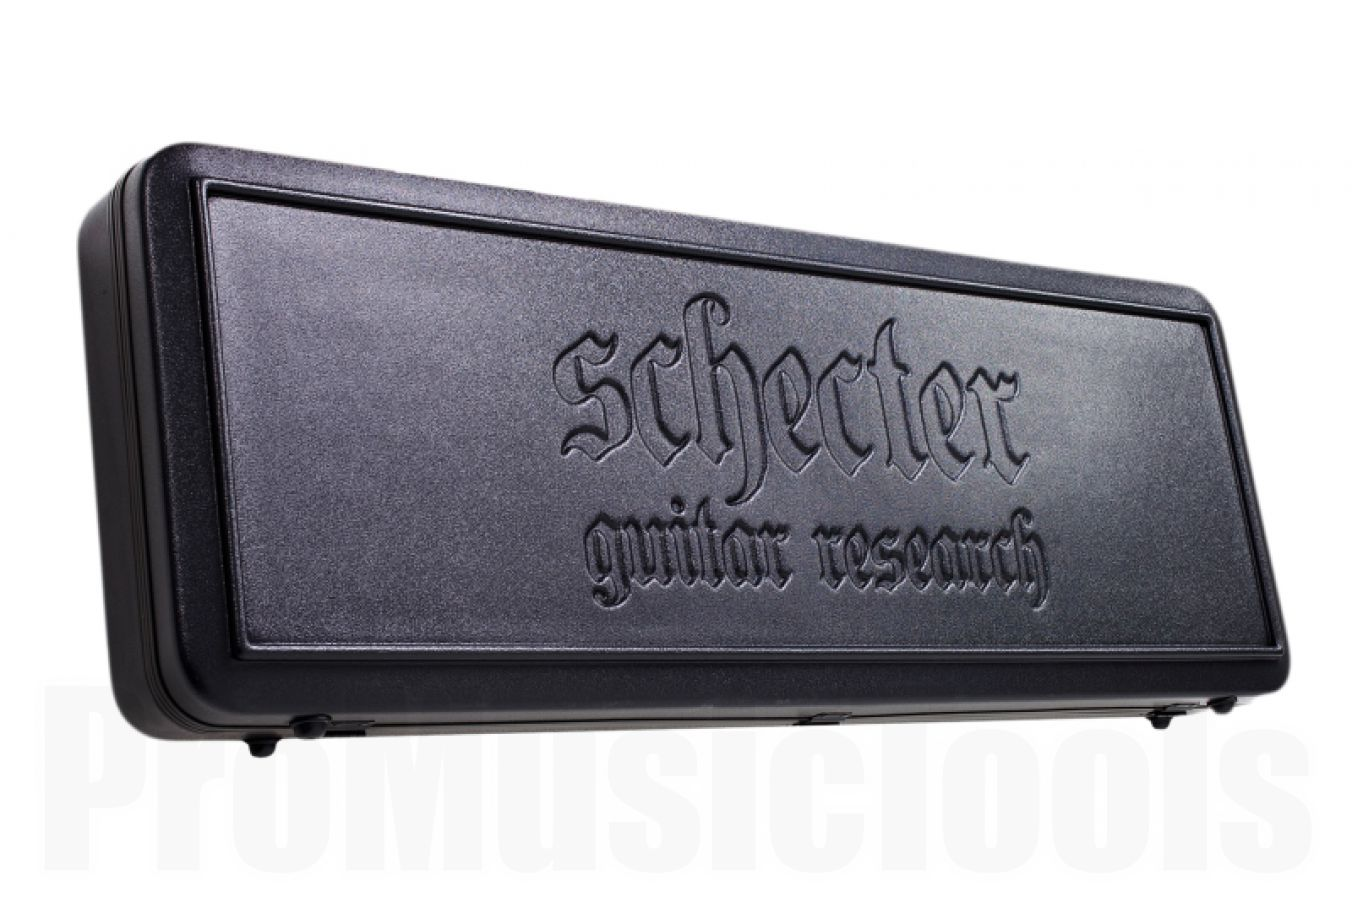 Schecter SGR-Universal guitar hardcase